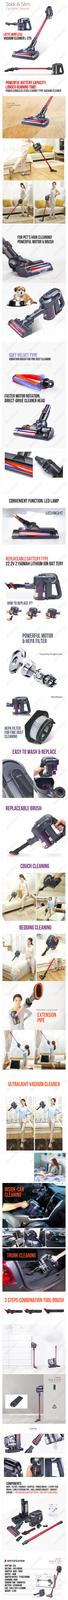 [LOTTE] Lotte / Cordless Vacuum Cleaner L-275 / Home Electronics / Vacuum Cleane